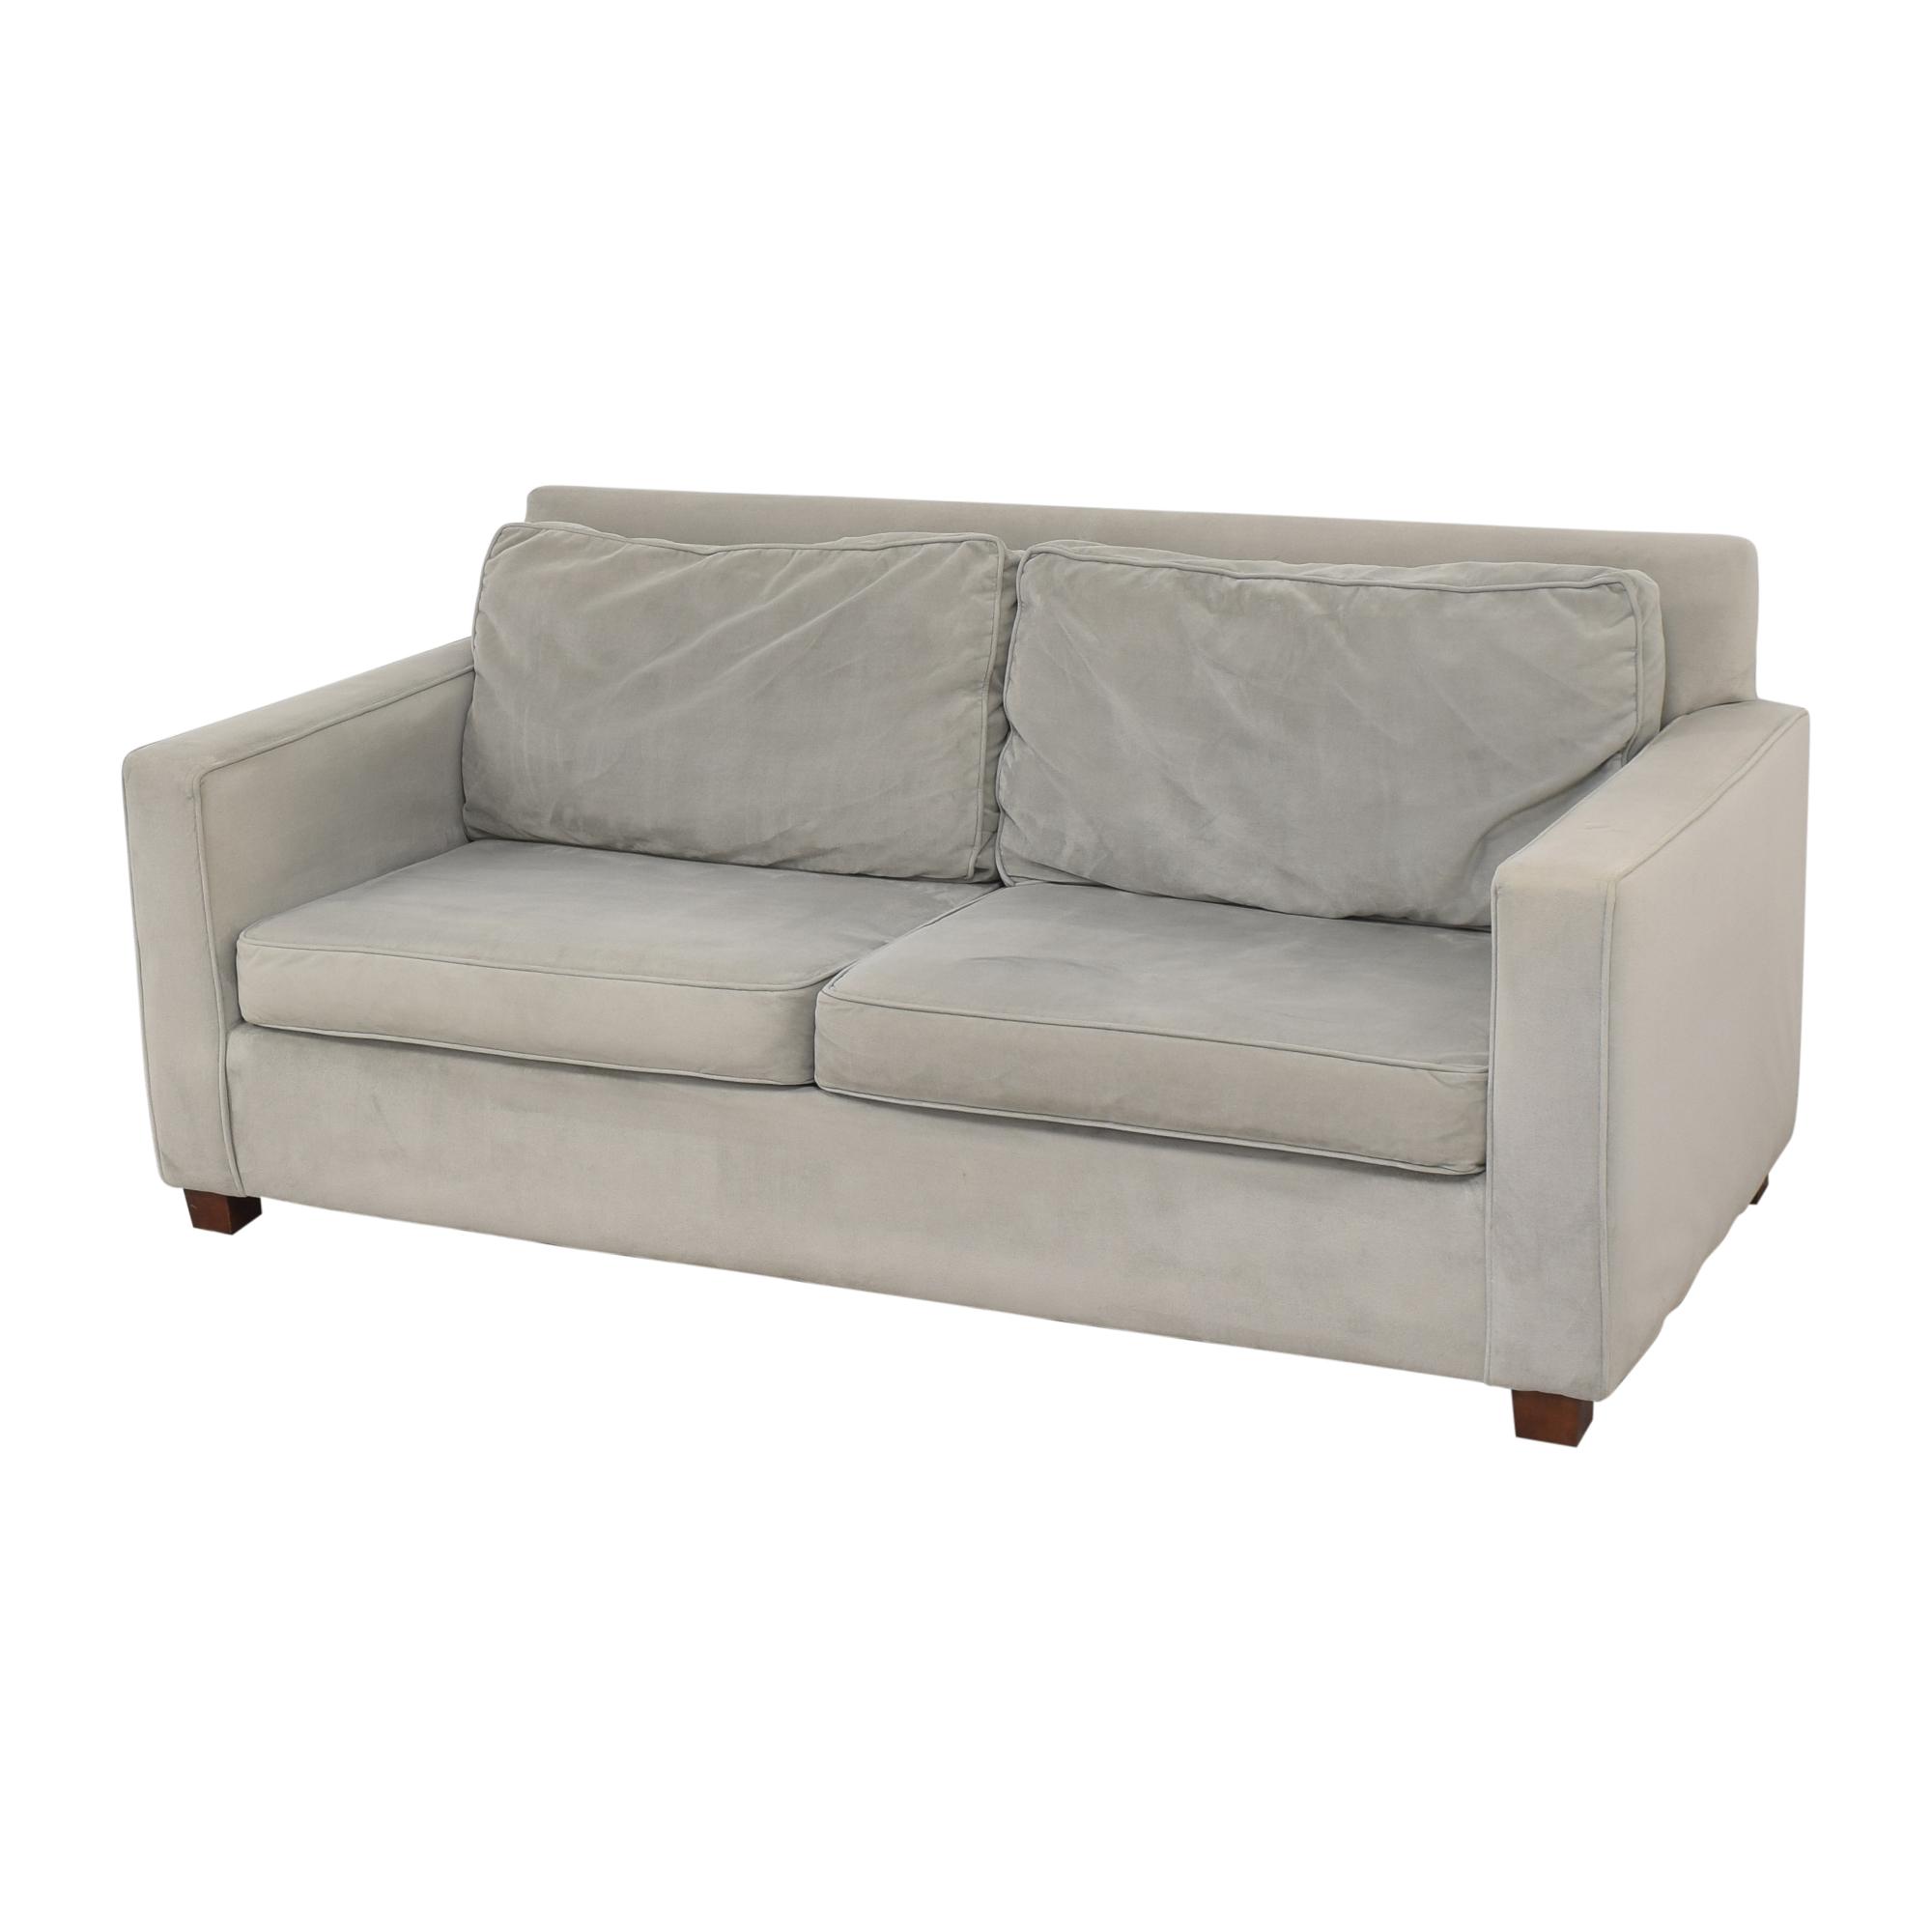 West Elm West Elm Henry Two Cushion Sofa used